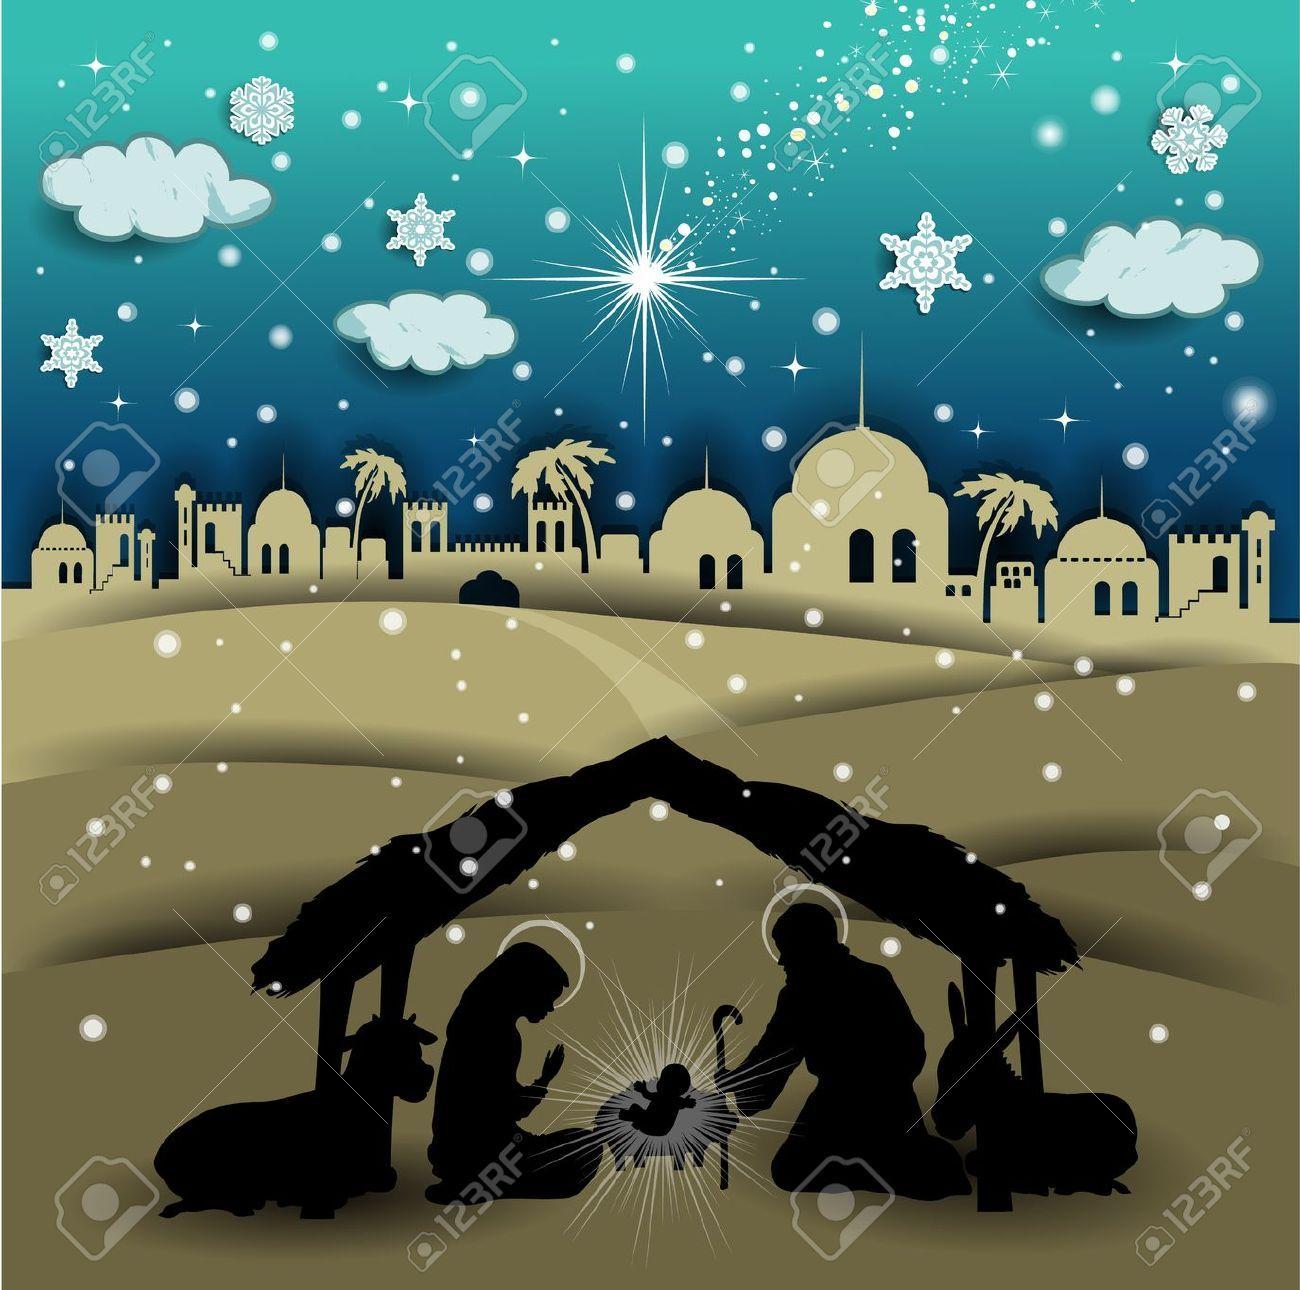 sfondo paesaggio presepe  Cerca con Google  natale  Christmas poems Christmas backdrops e Nativity